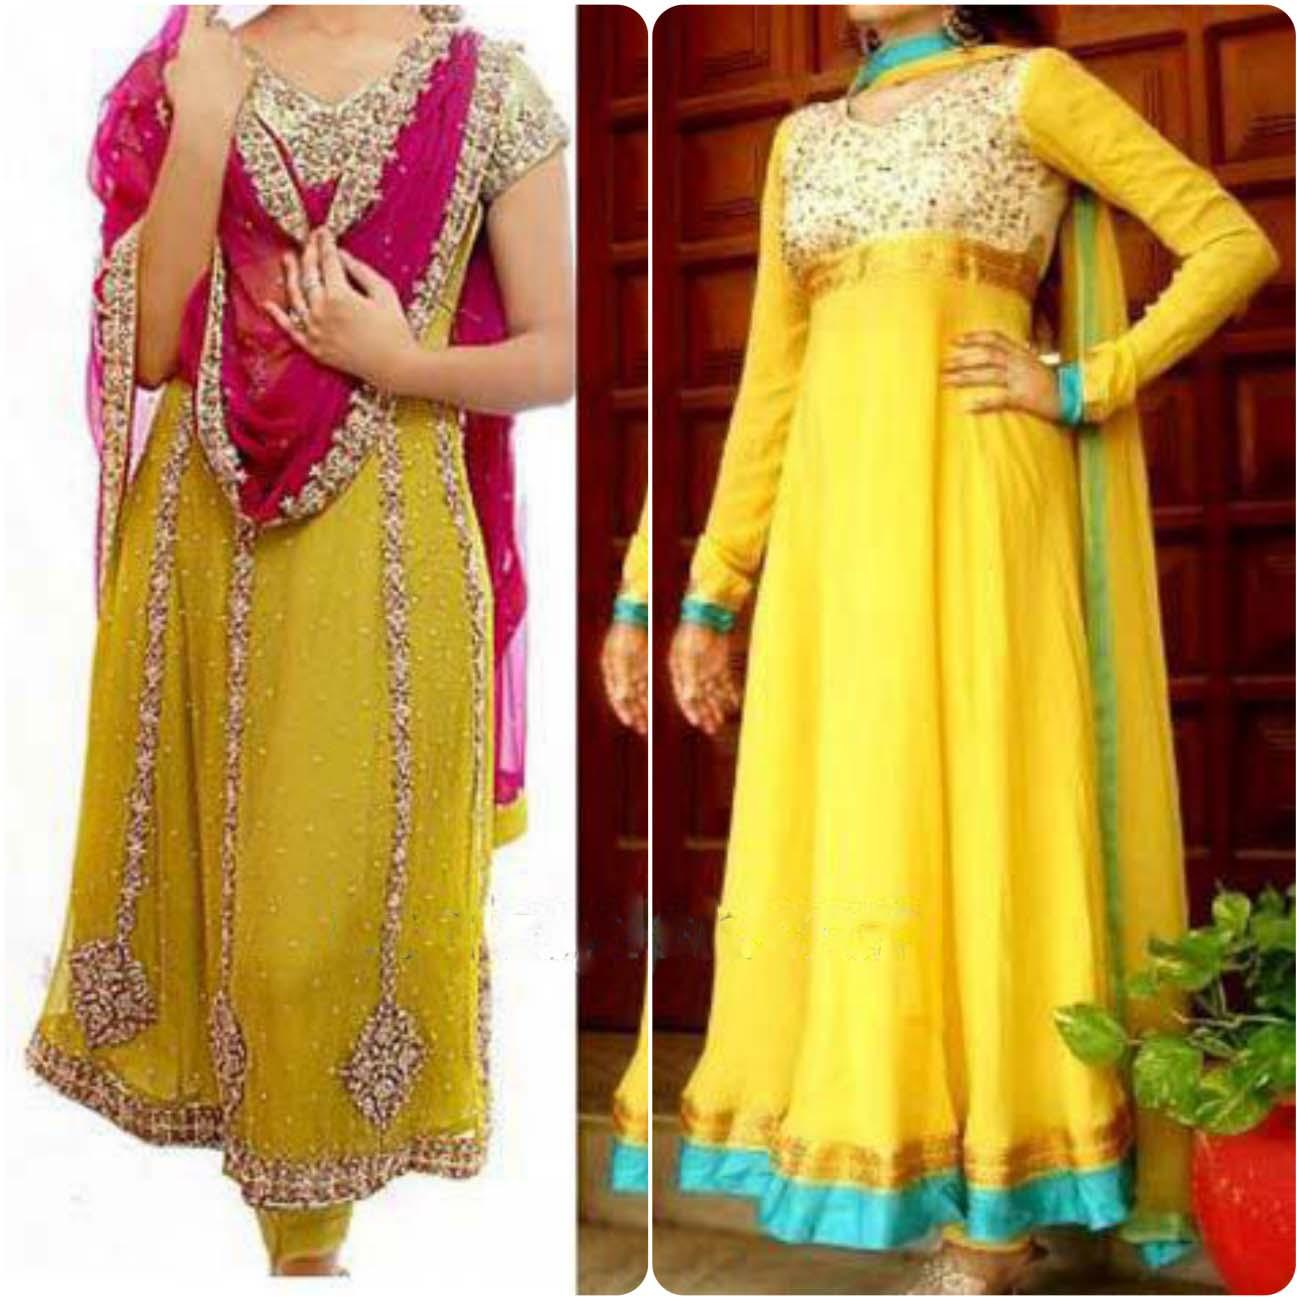 Mehndi Dresses 2016 : Mehendi dresses for asian brides stylo planet